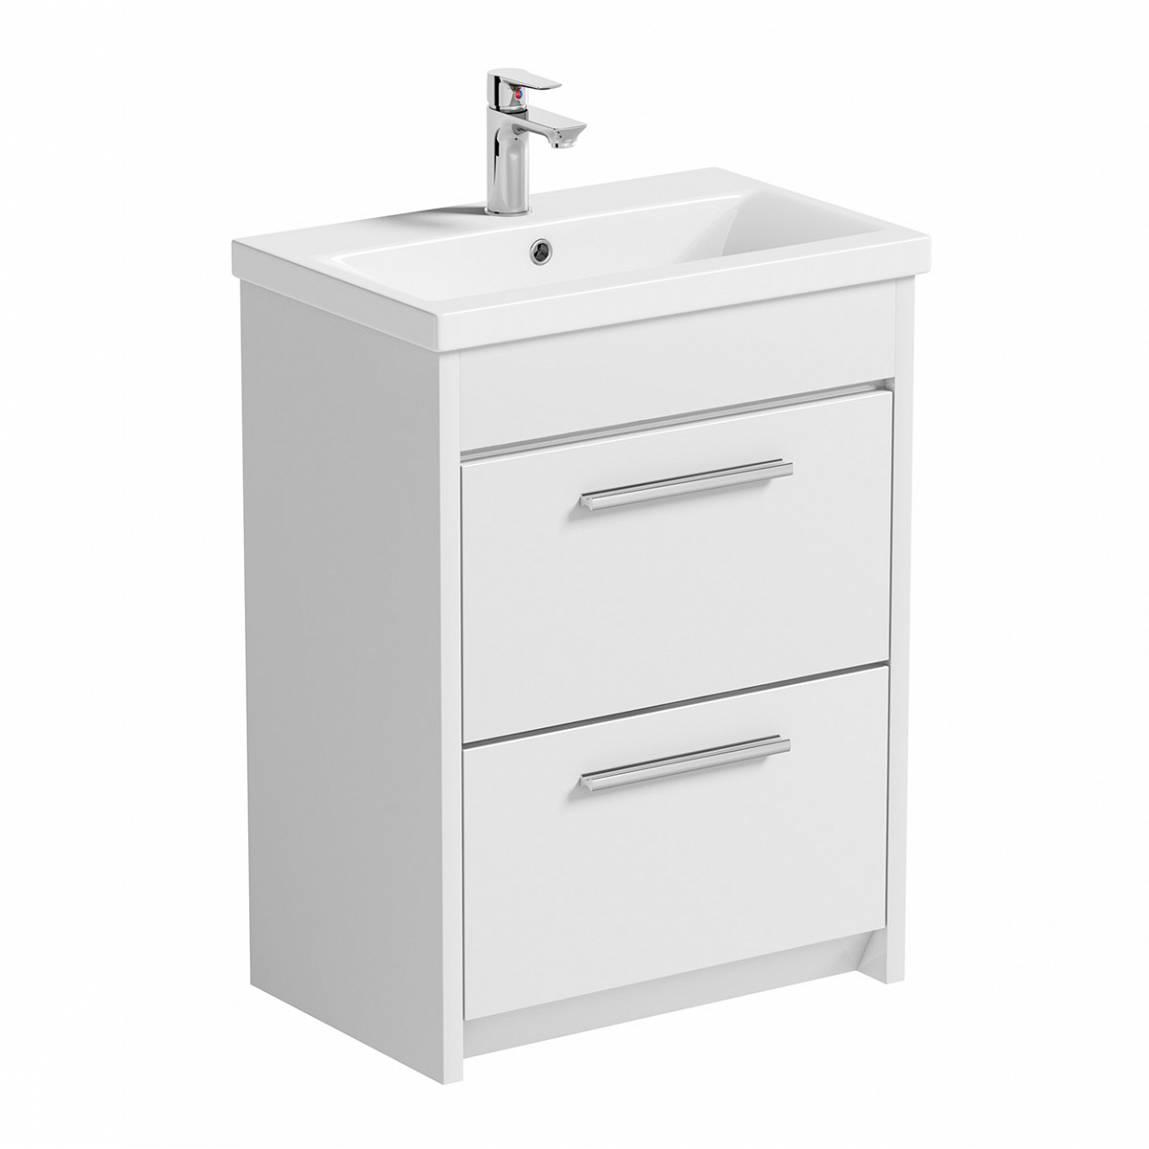 Image of Smart White Floor Mounted 600 Drawer Unit & Basin